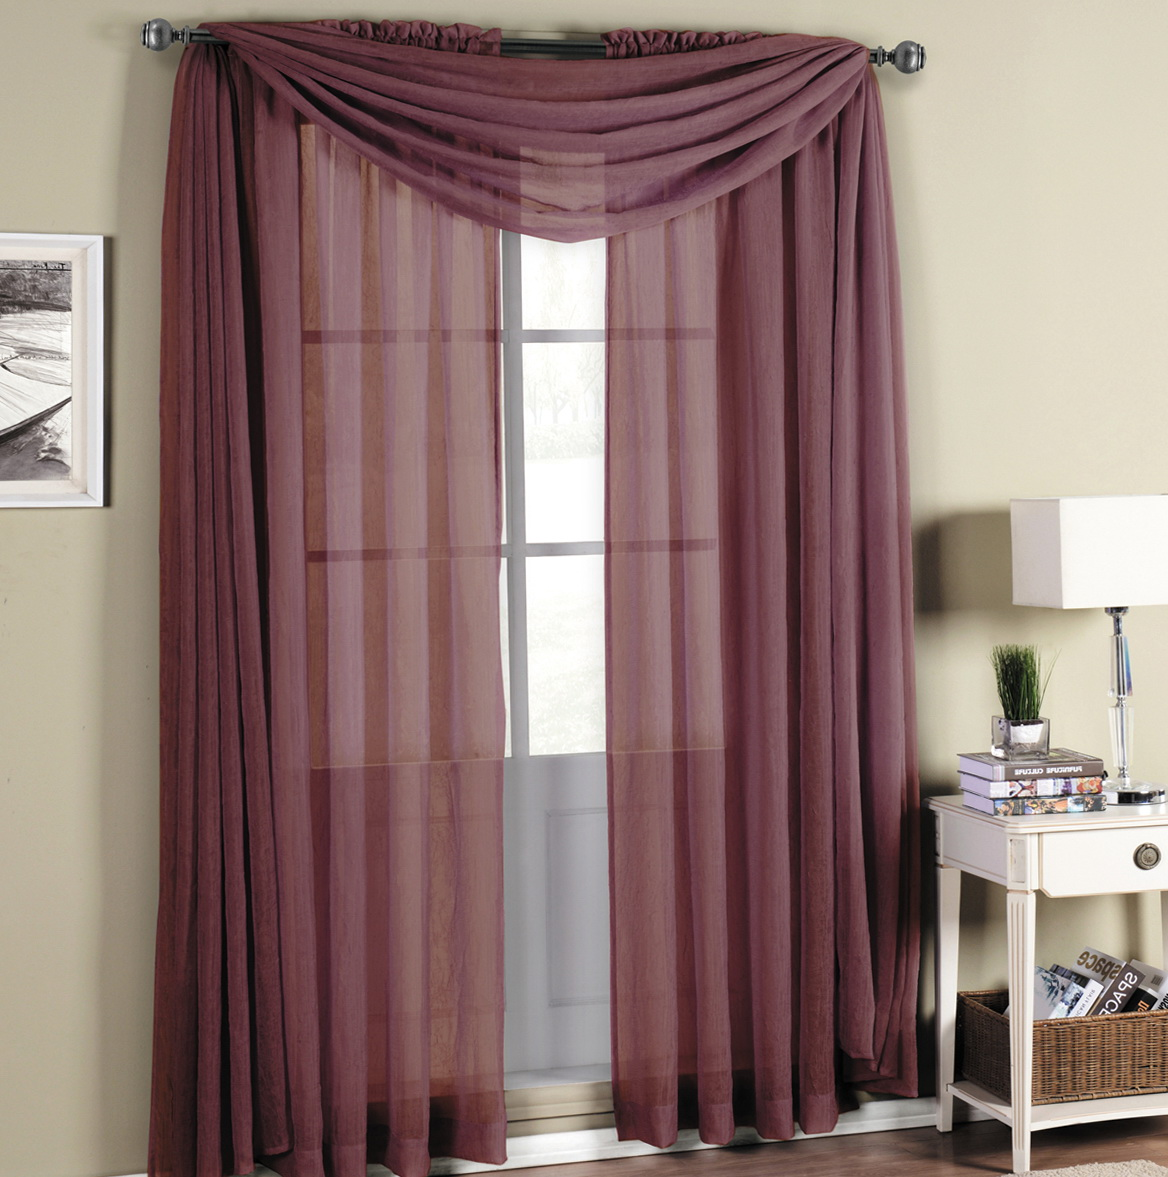 Tiffany Blue Sheer Curtains